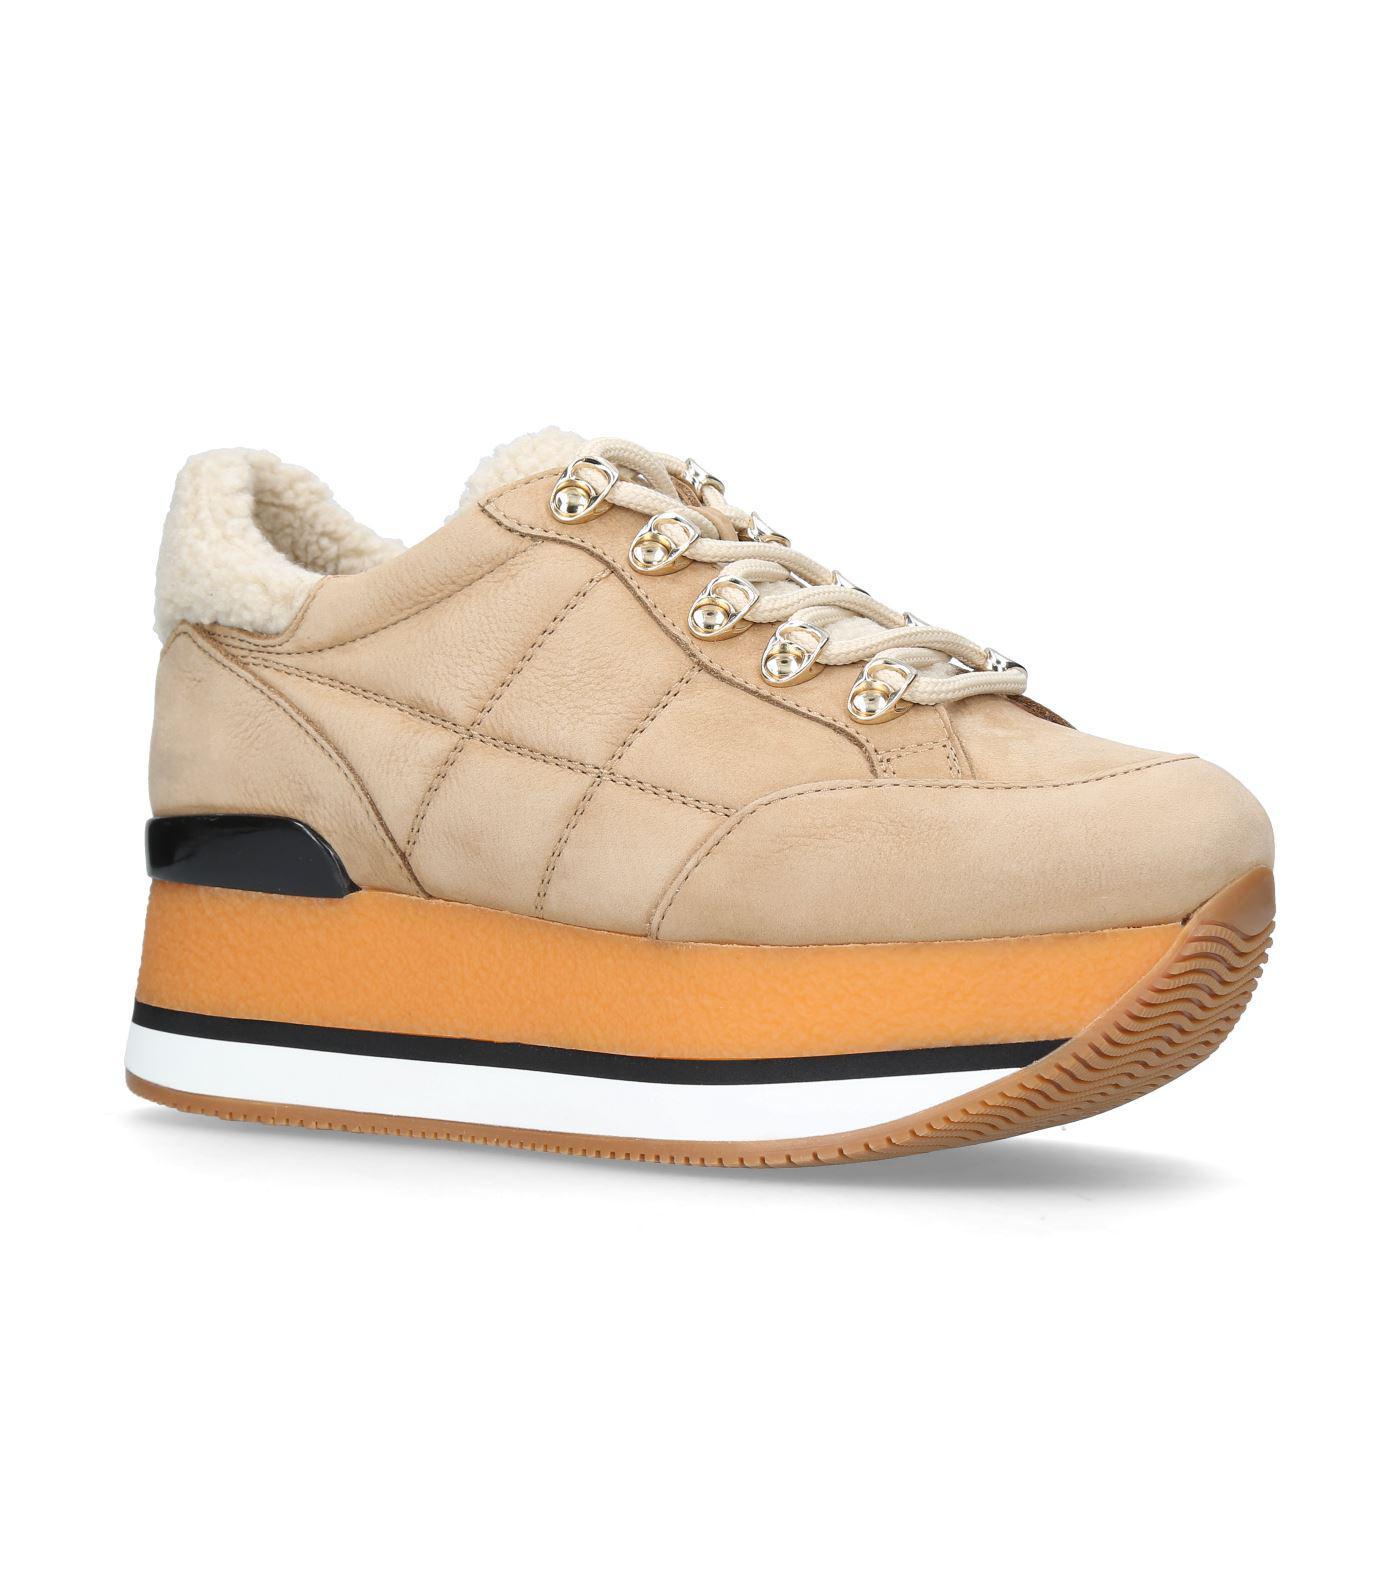 maxi platform sneakers - White Hogan A23DvorSiz